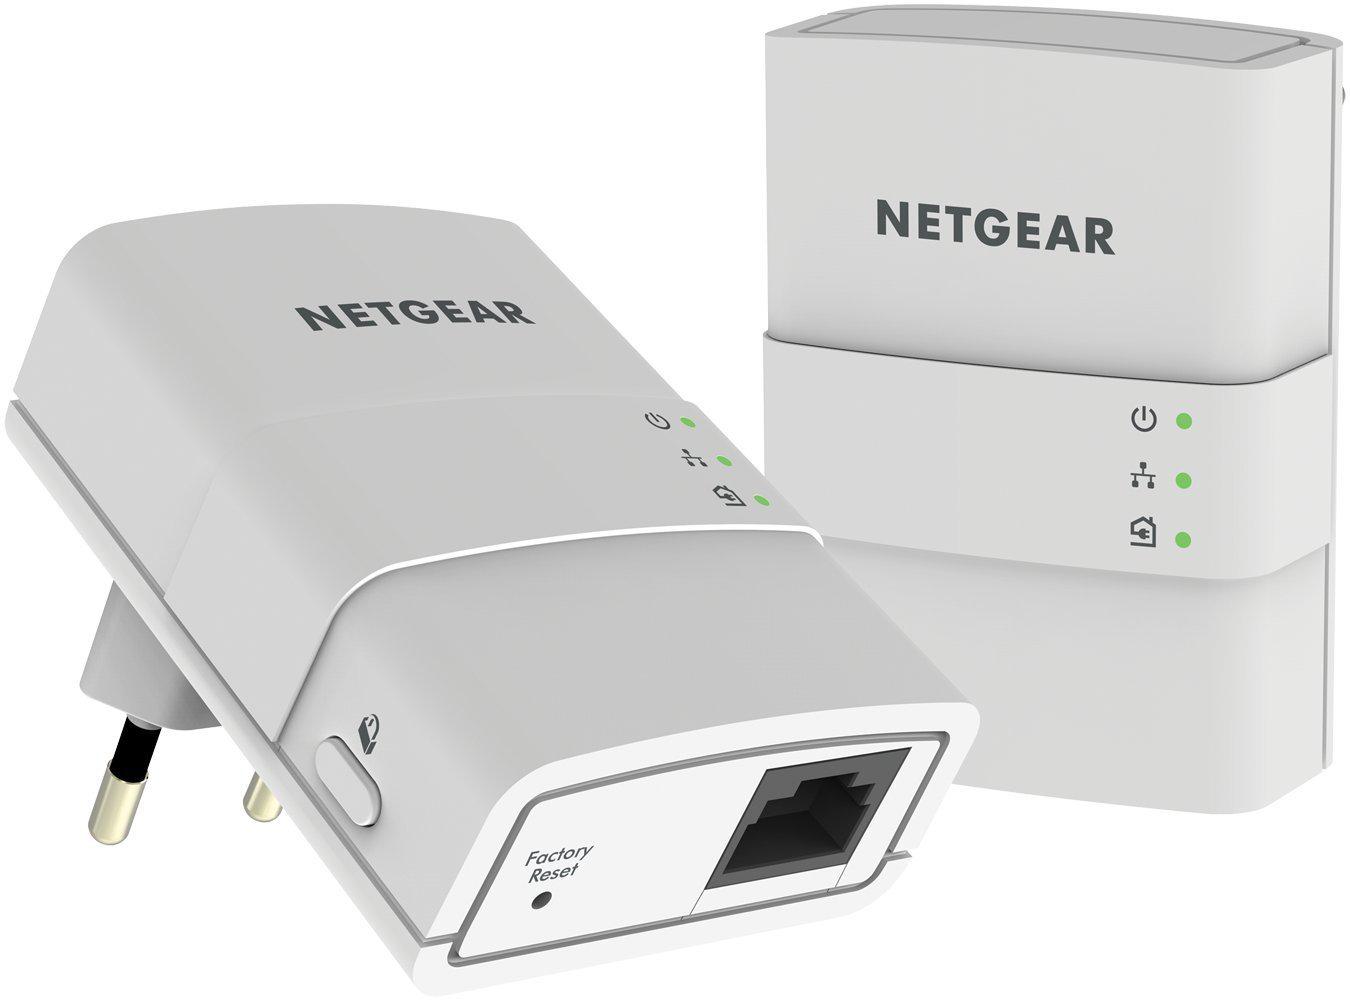 Pack de 2 CPL Netgear XAVB5221-100PES 500 Mbps